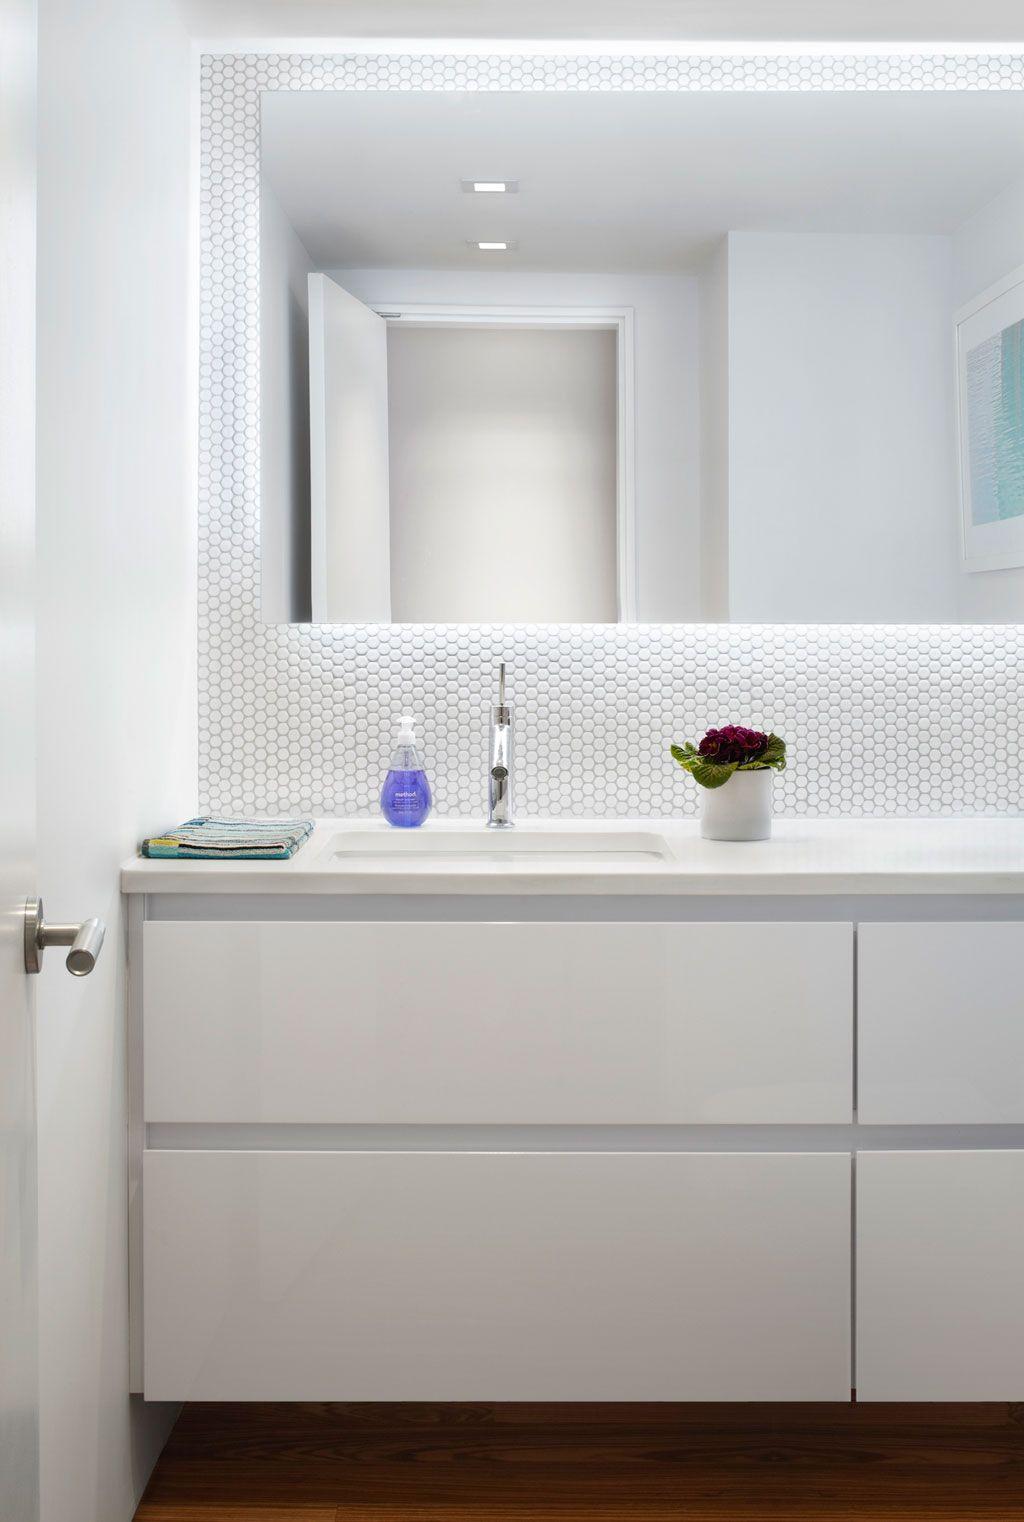 Perfekt Sechseck Mosaik Glas Weiß Bad